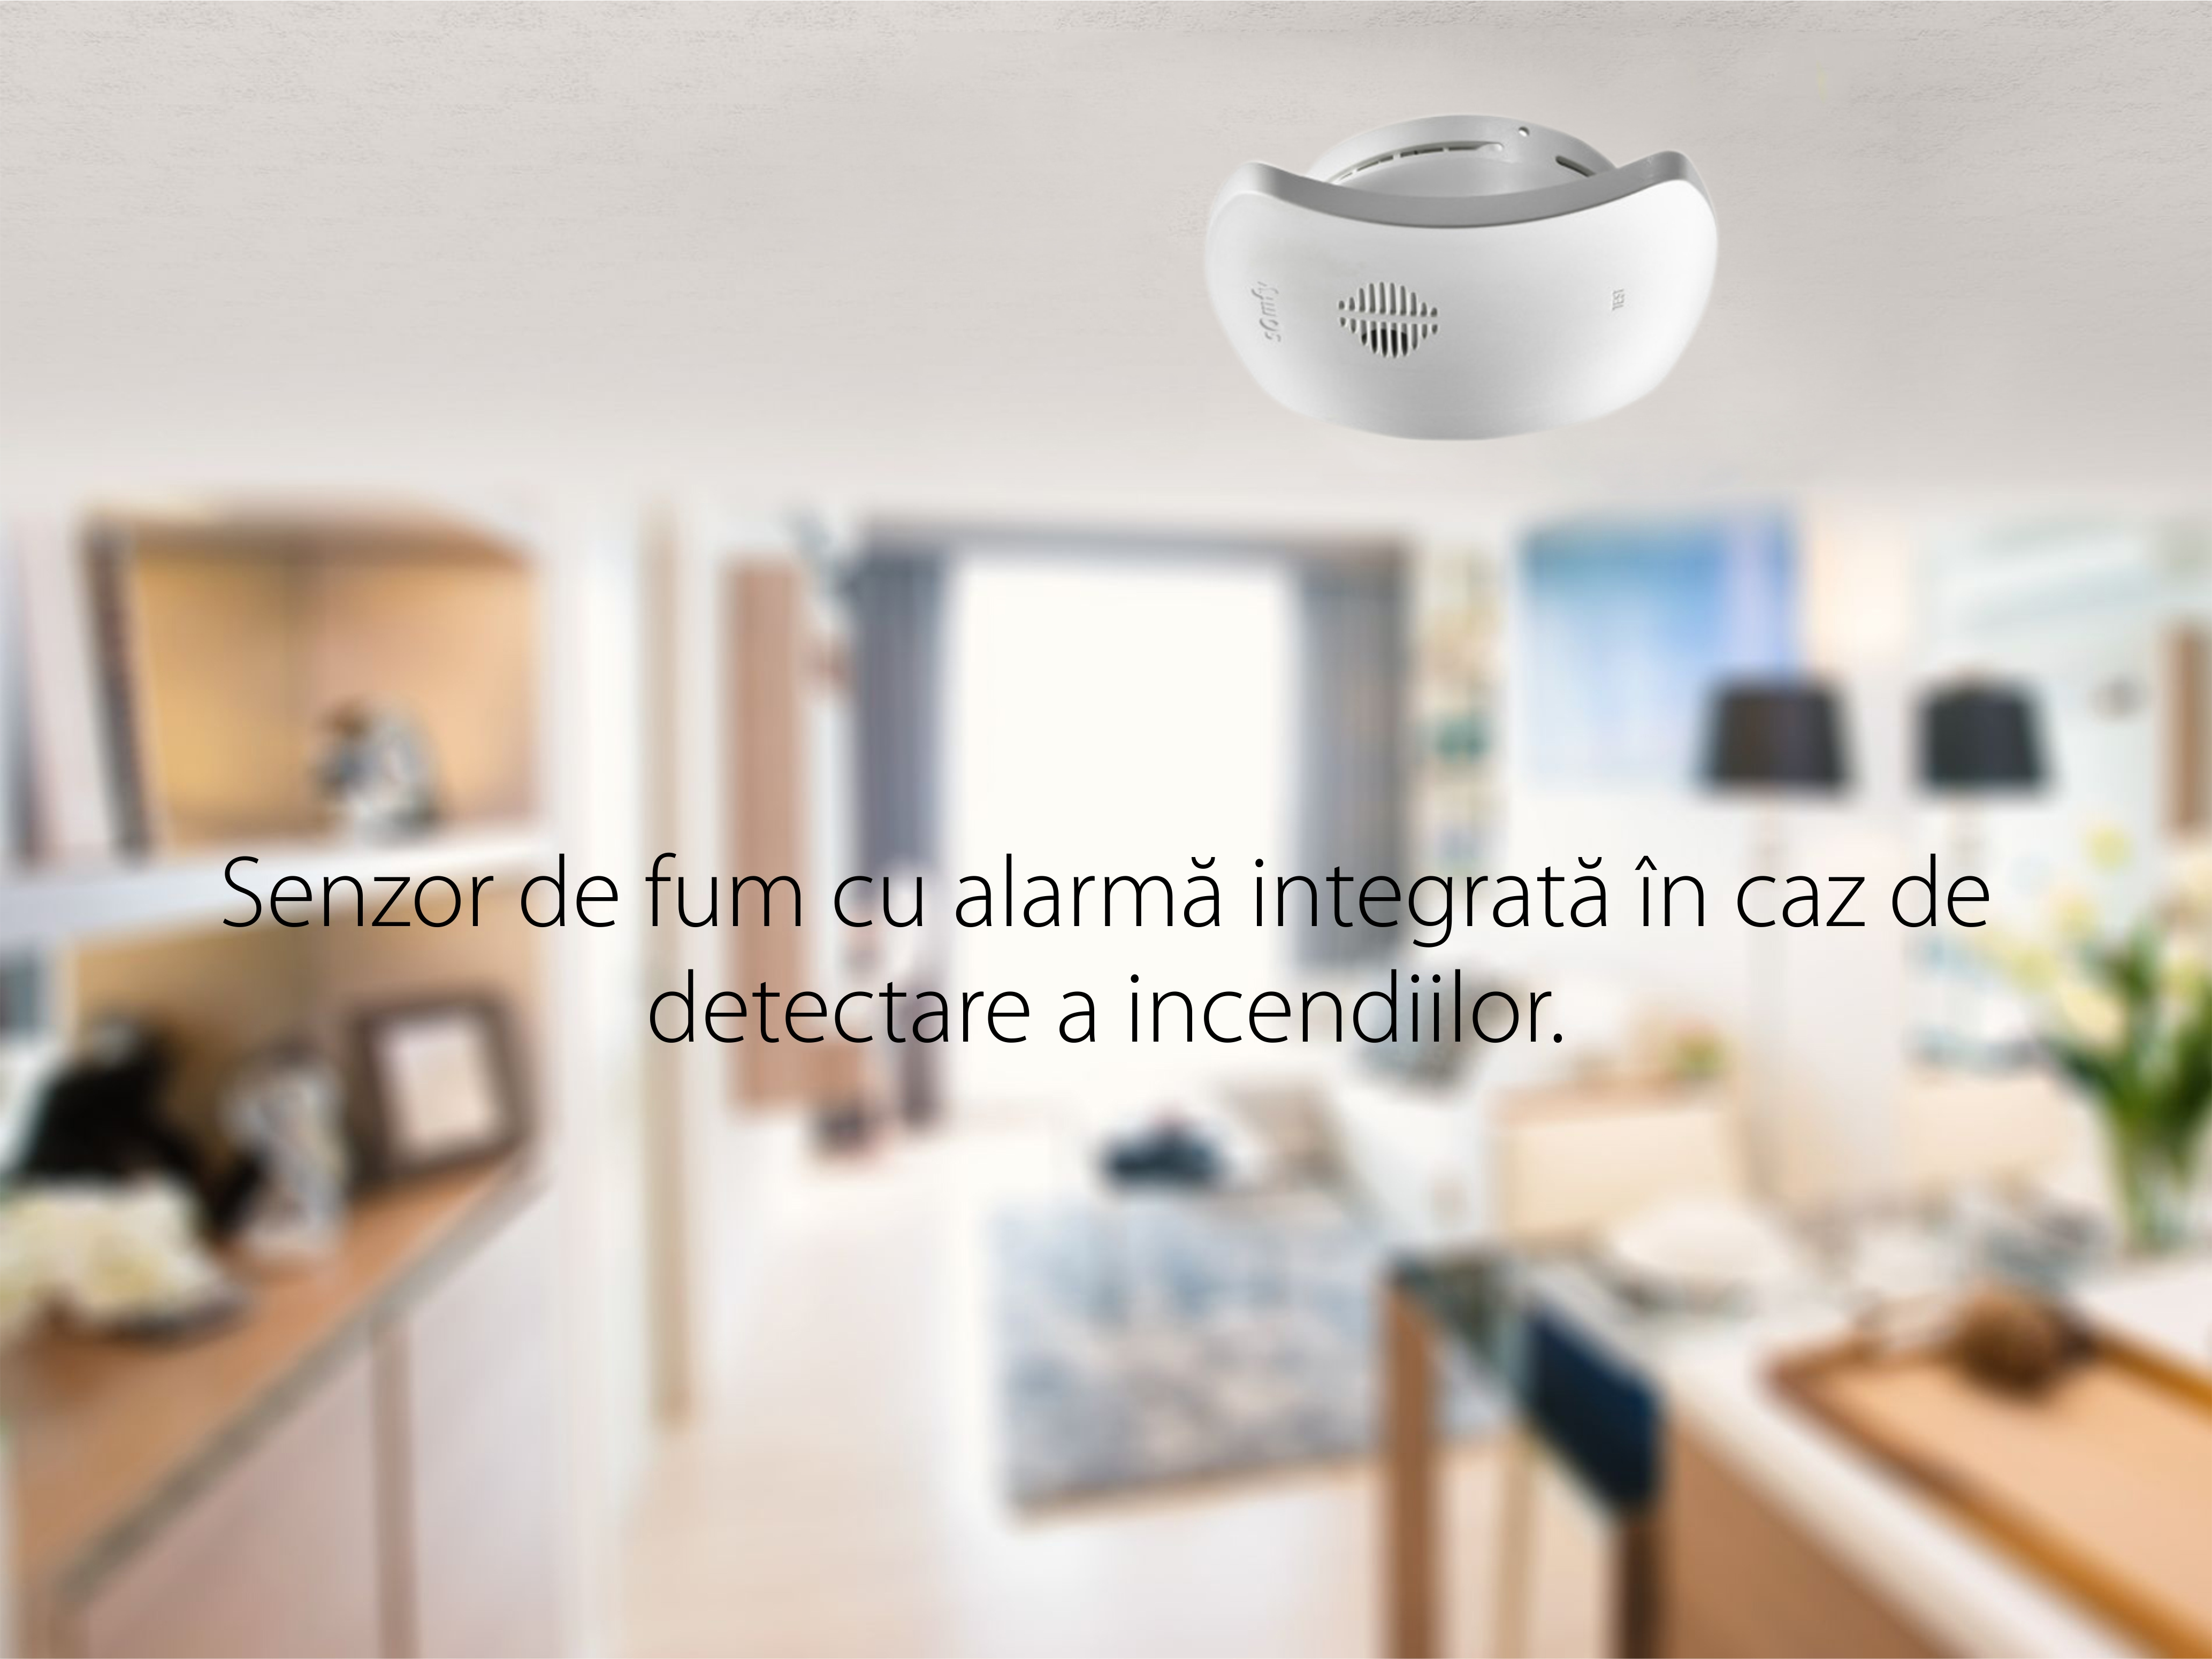 Senzor de fum TaHoma cu Alarma Integrata pentru Detectarea incendiilor, IP20, Frecventa radio 868-870 MHz